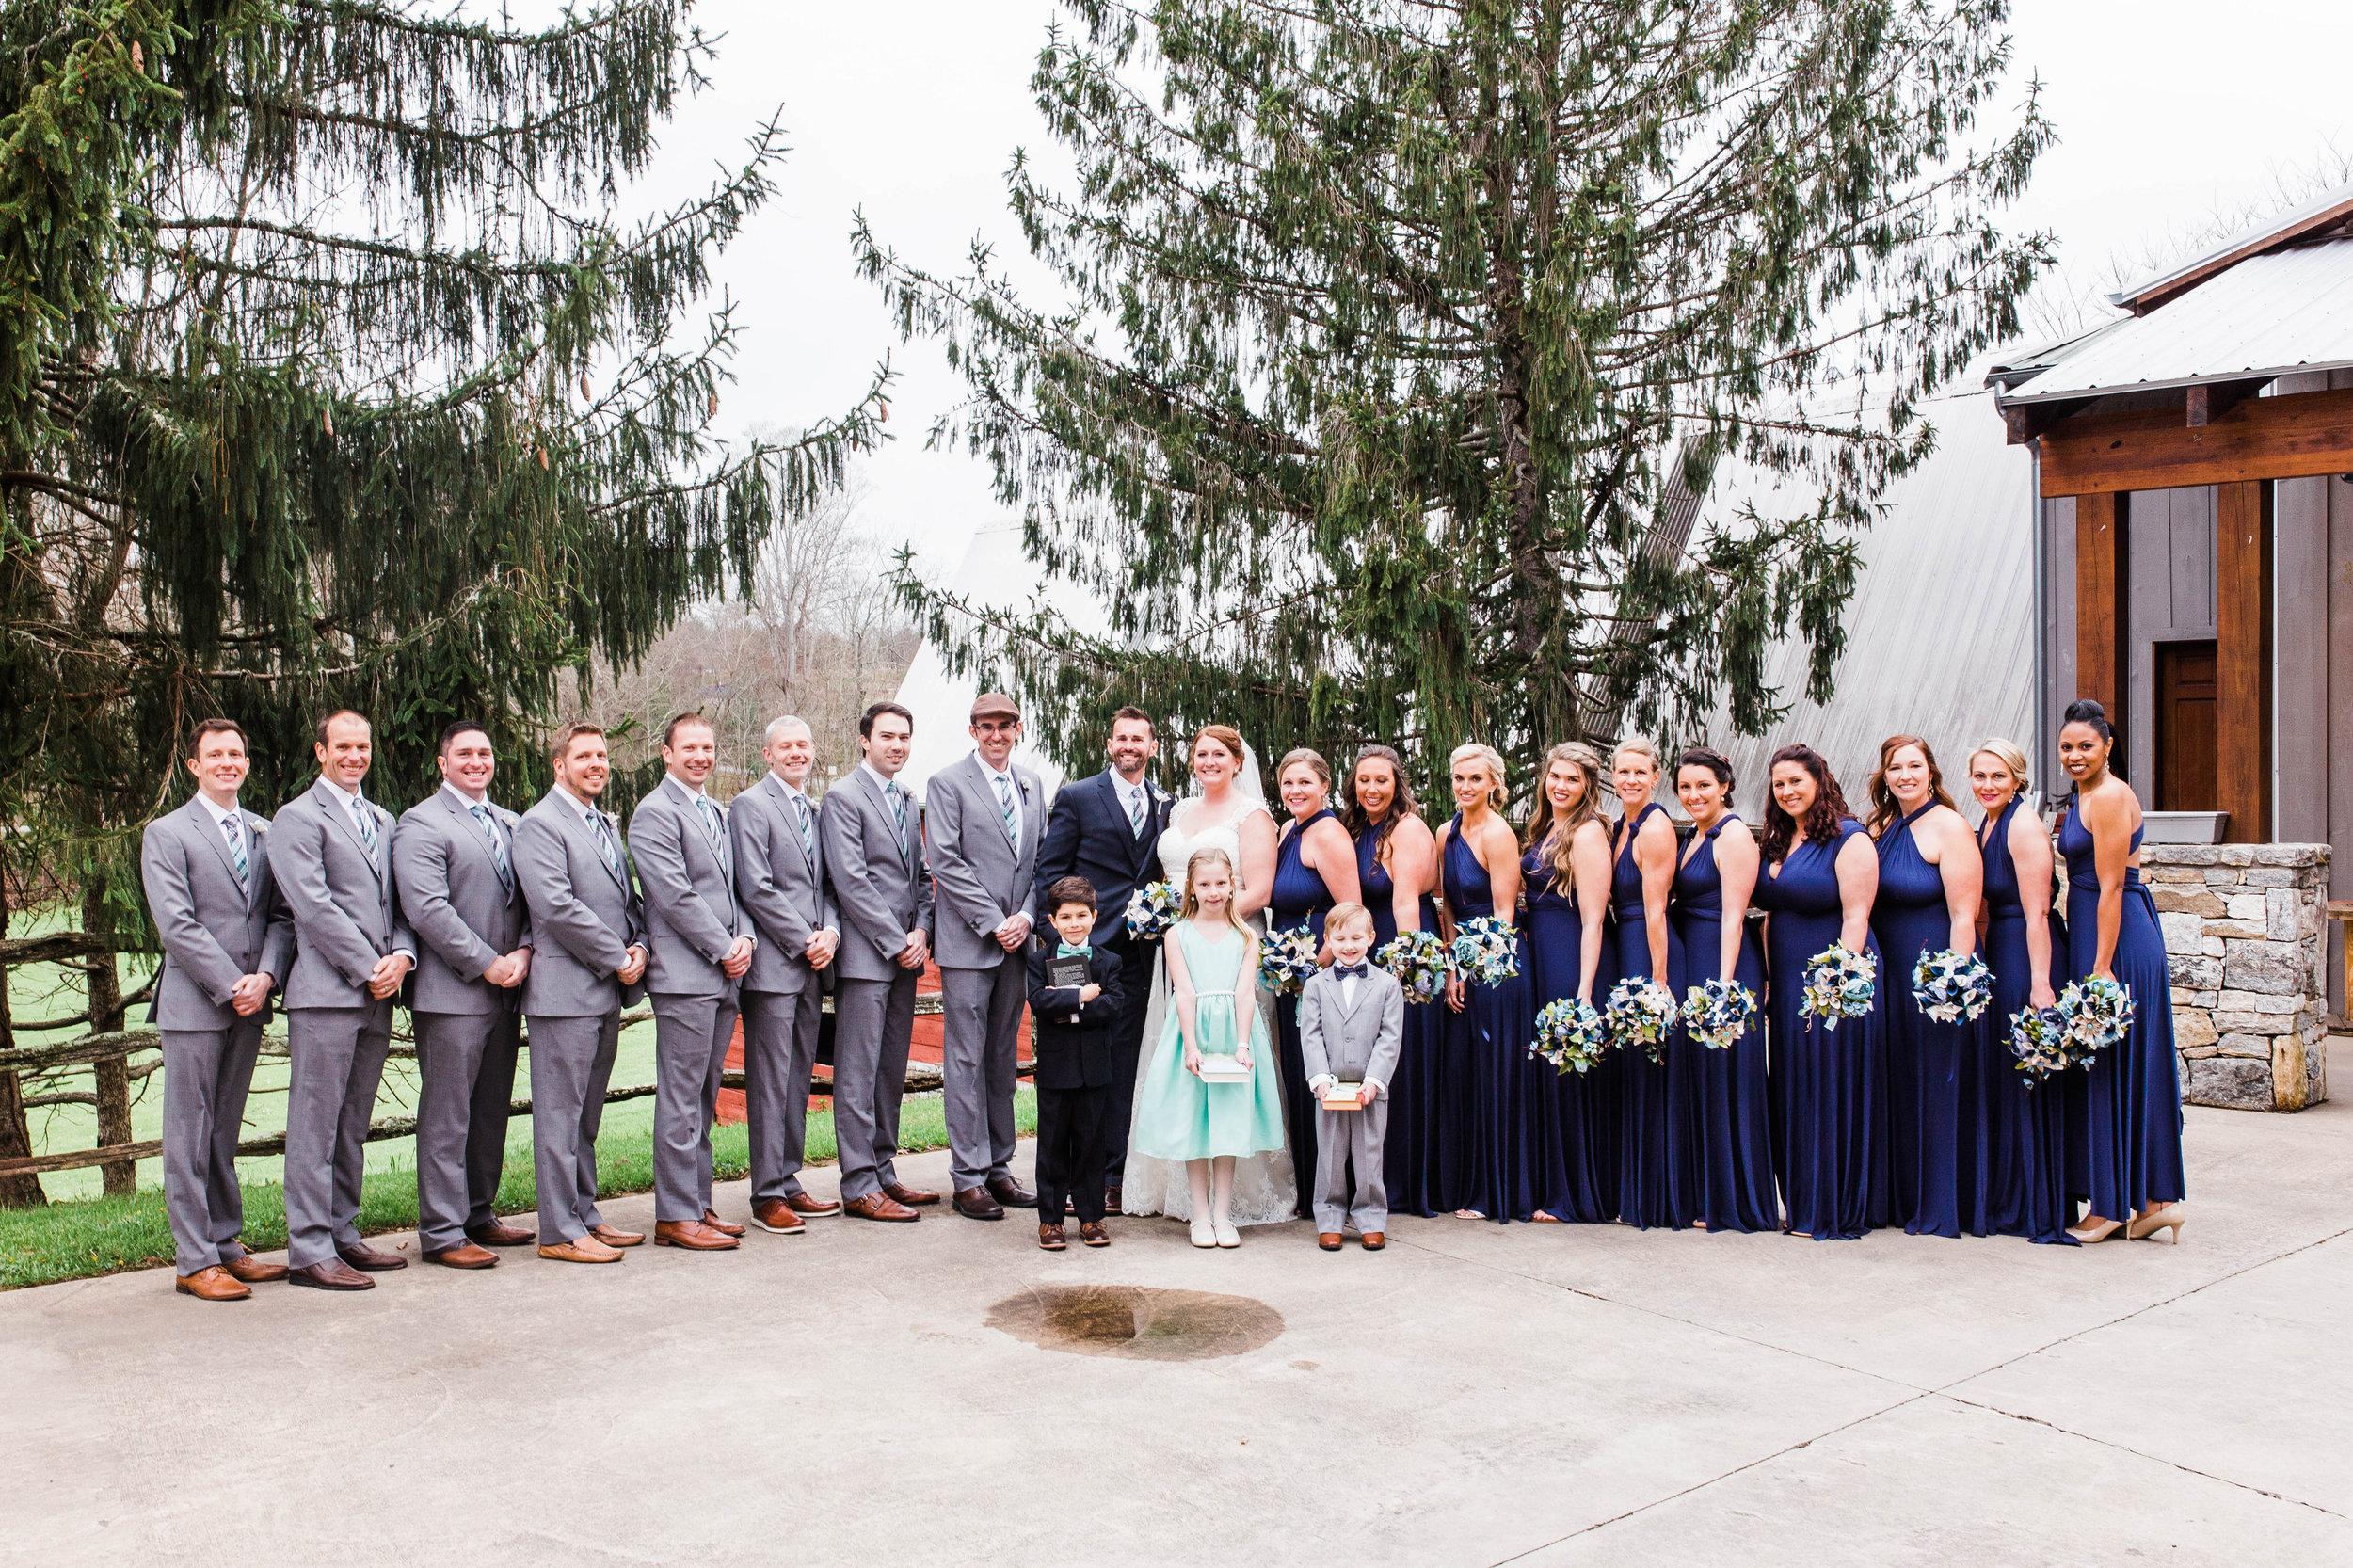 Honeysuckle-Hill-Weddings-Andrew-Rachel-97.jpg